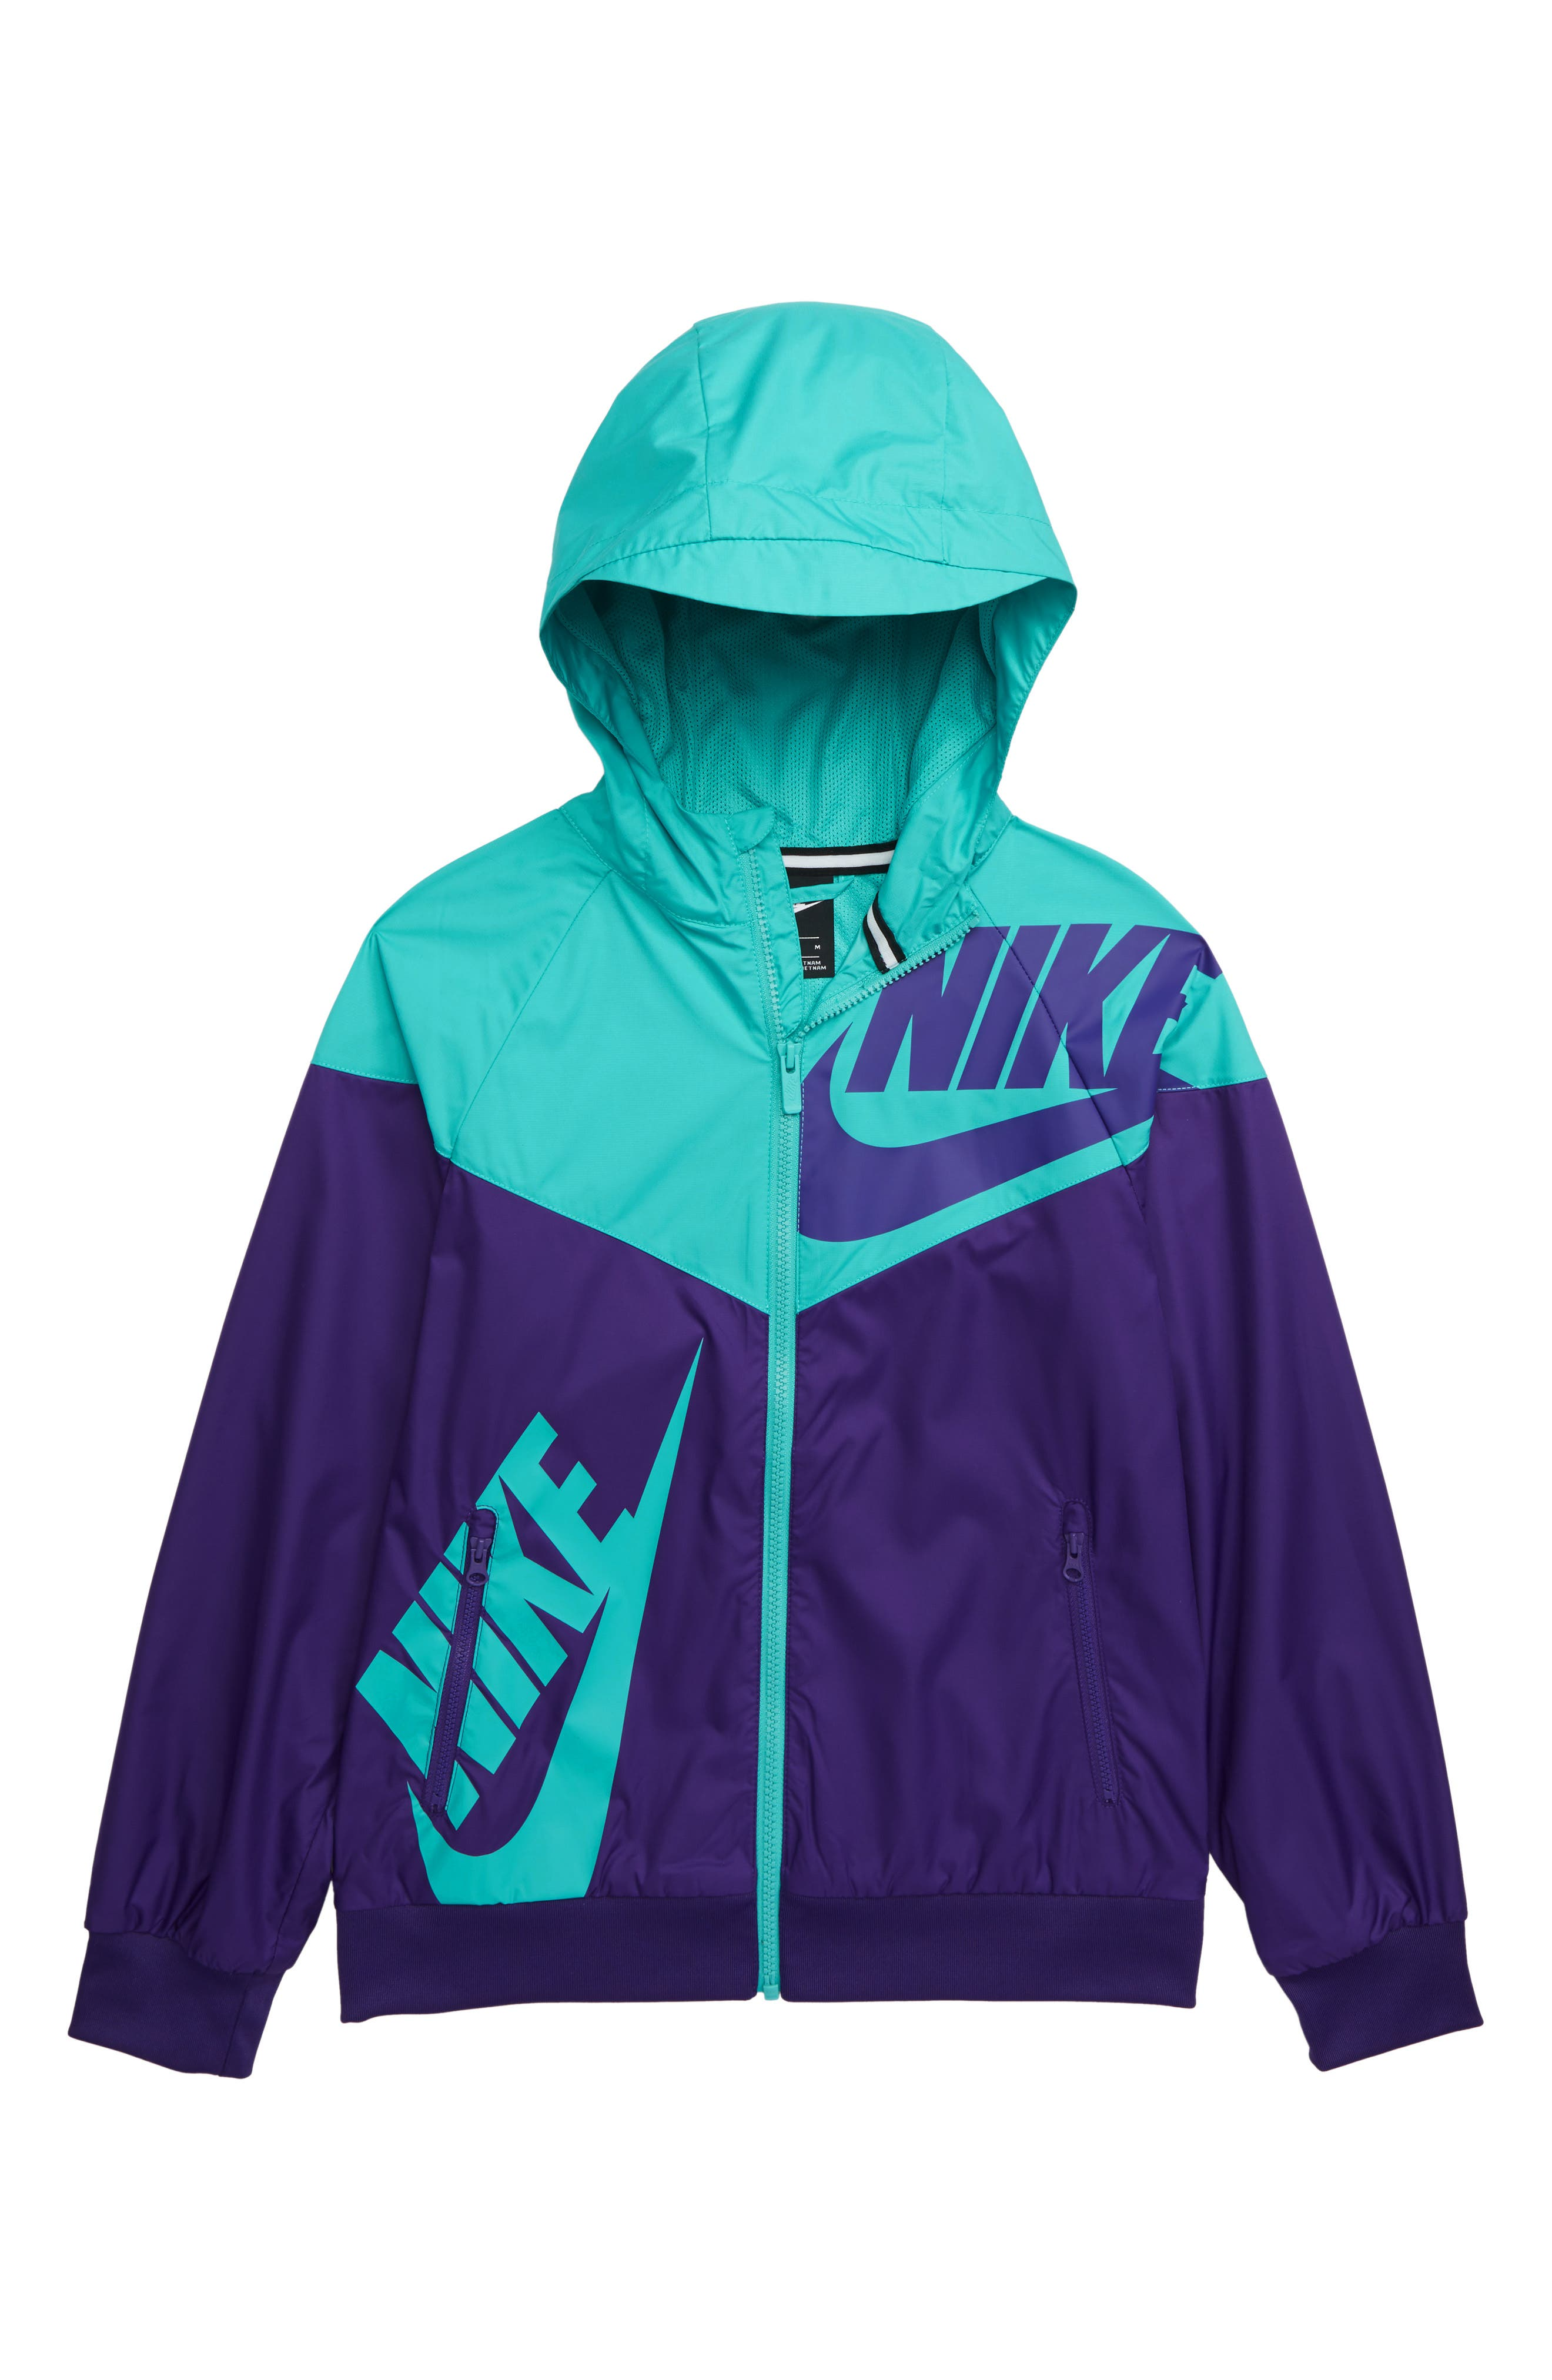 NIKE Sportswear Windrunner Zip Jacket, Main, color, COURT PURPLE/ CABANA